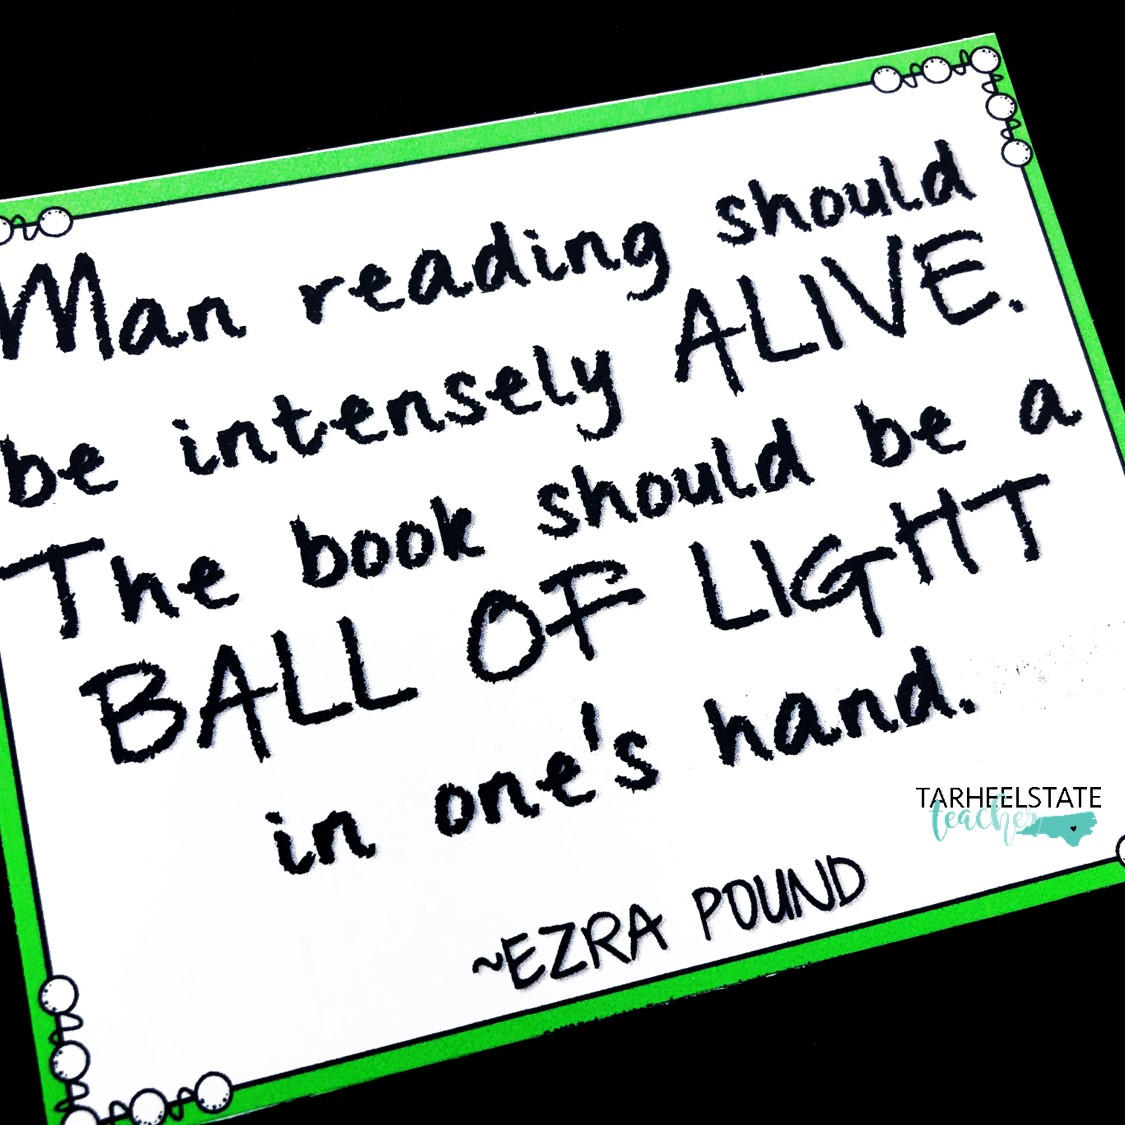 man reading quotation reading life.jpg